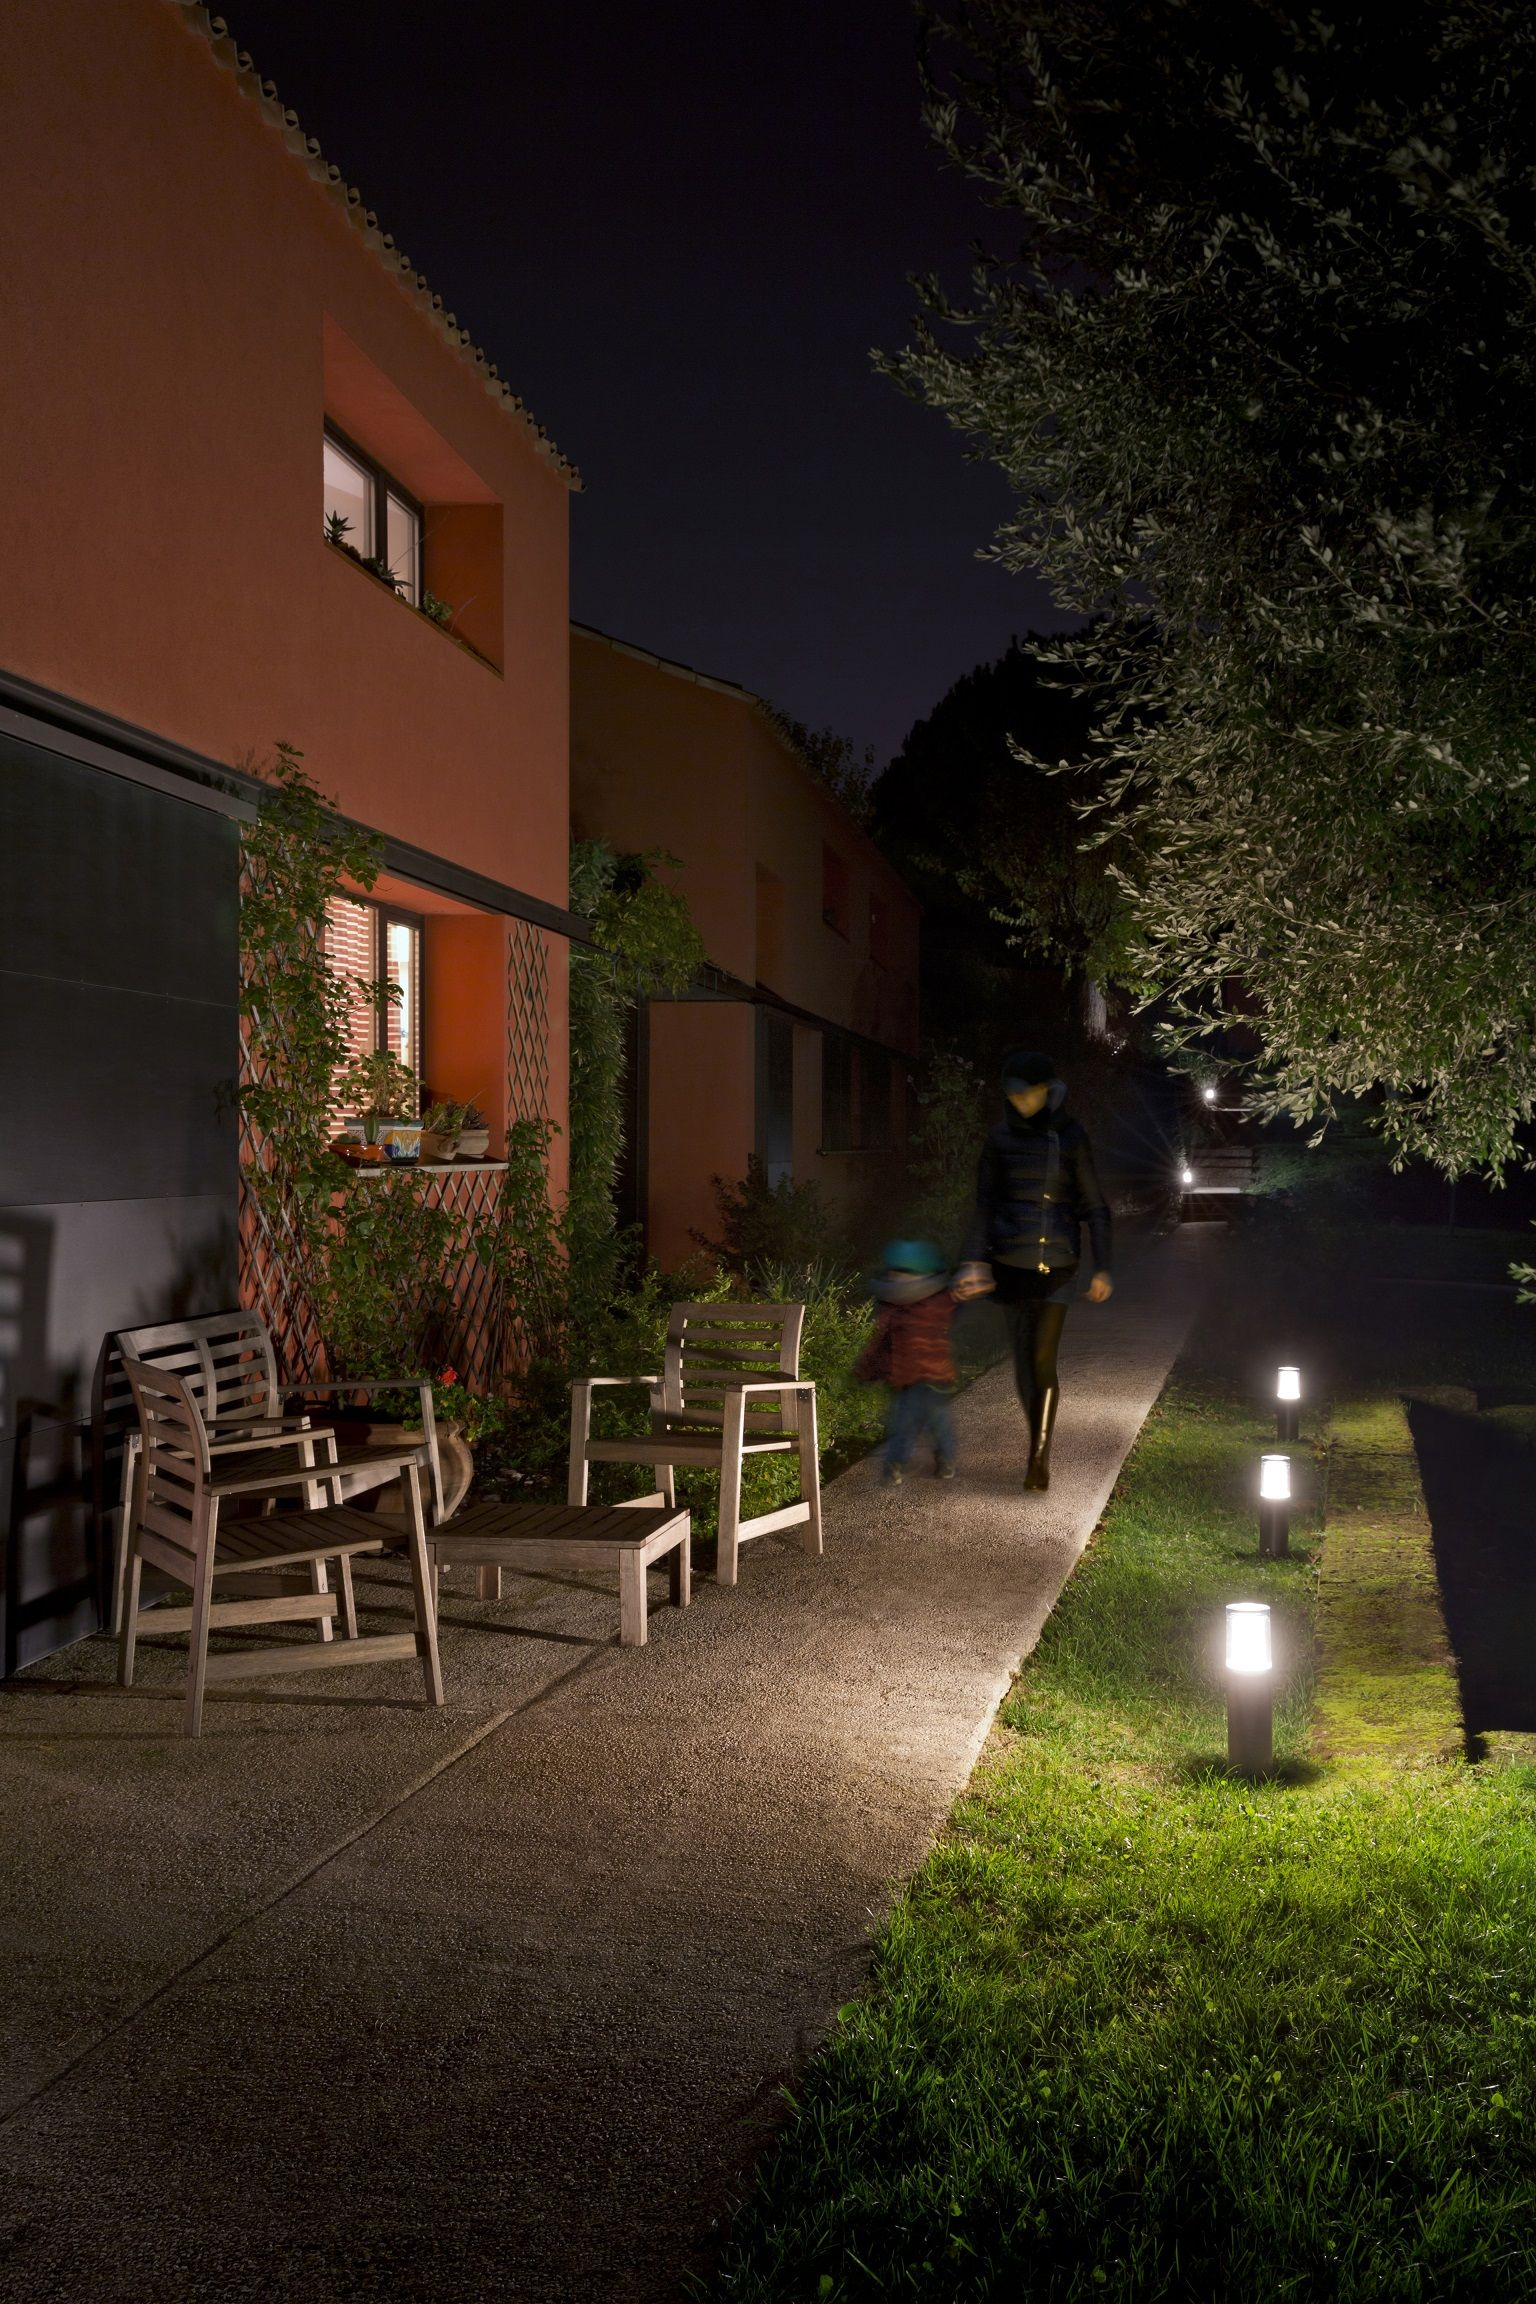 Lighting Systems Led Lights Iguzzini Illuminazione Giardino Illuminazione Esterna Giardino